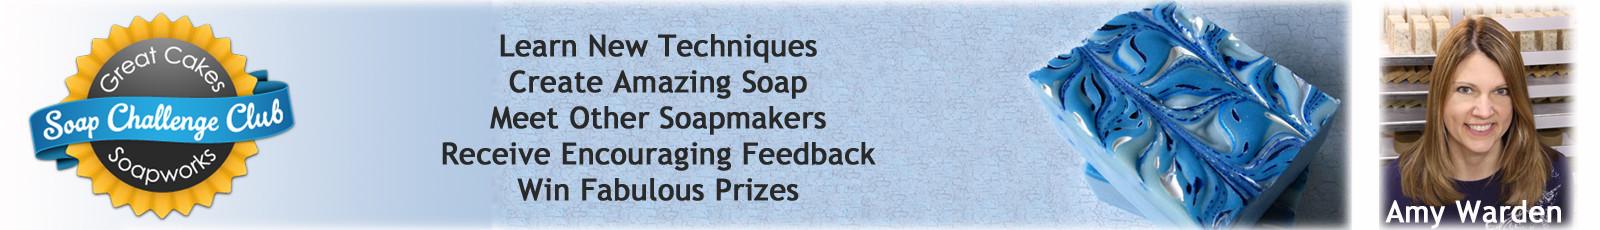 Soap Challenge Club